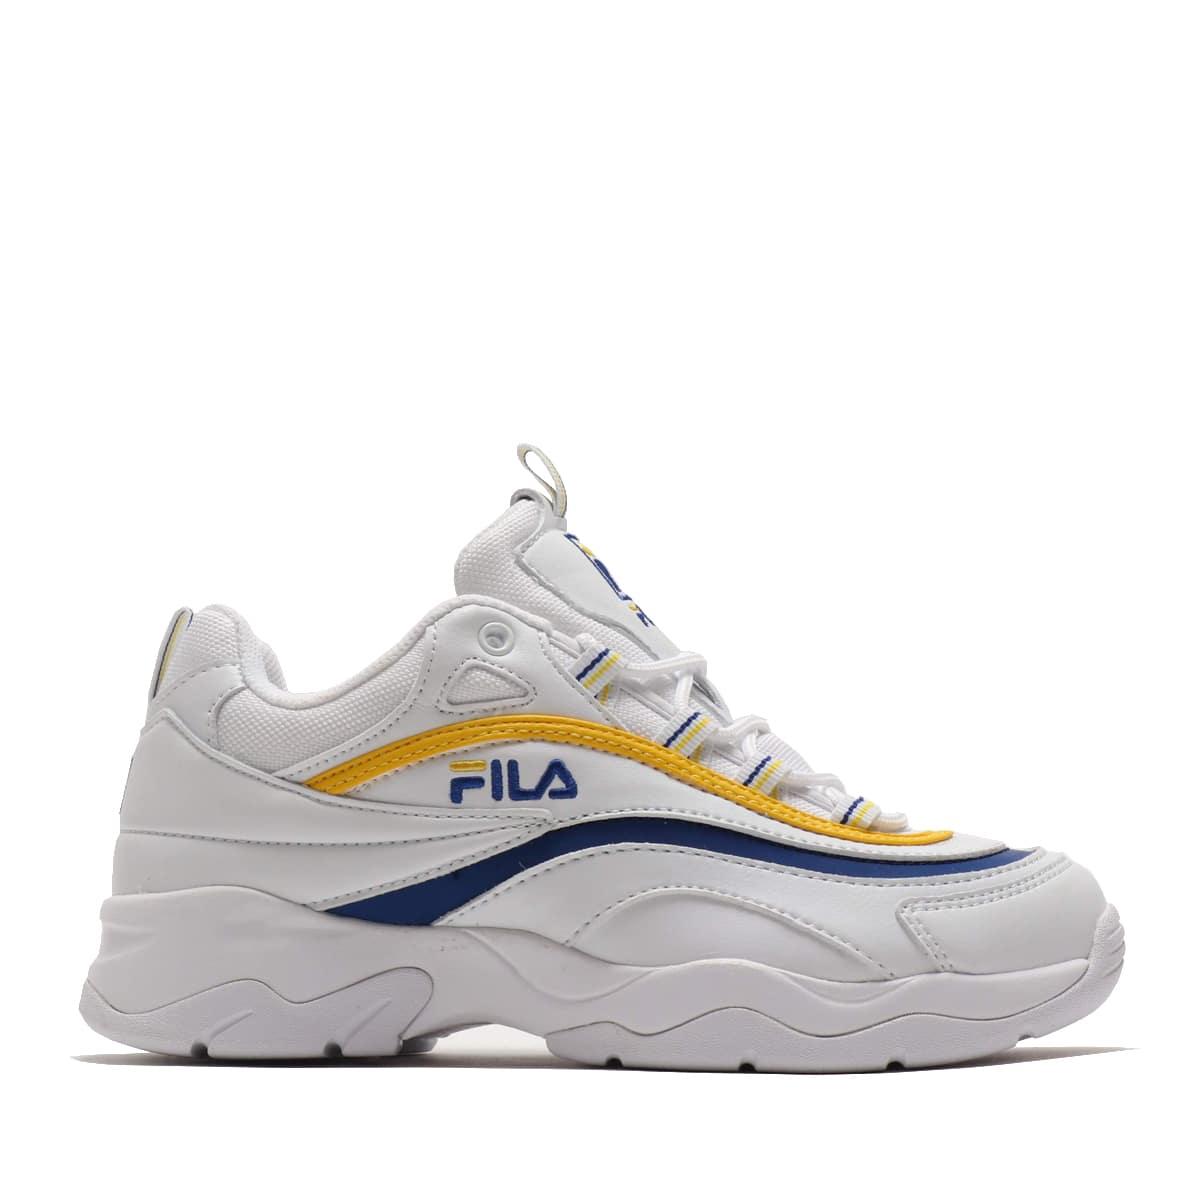 """FILA FILA RAY WHITE/BLUE 19SS-S""_photo_3"